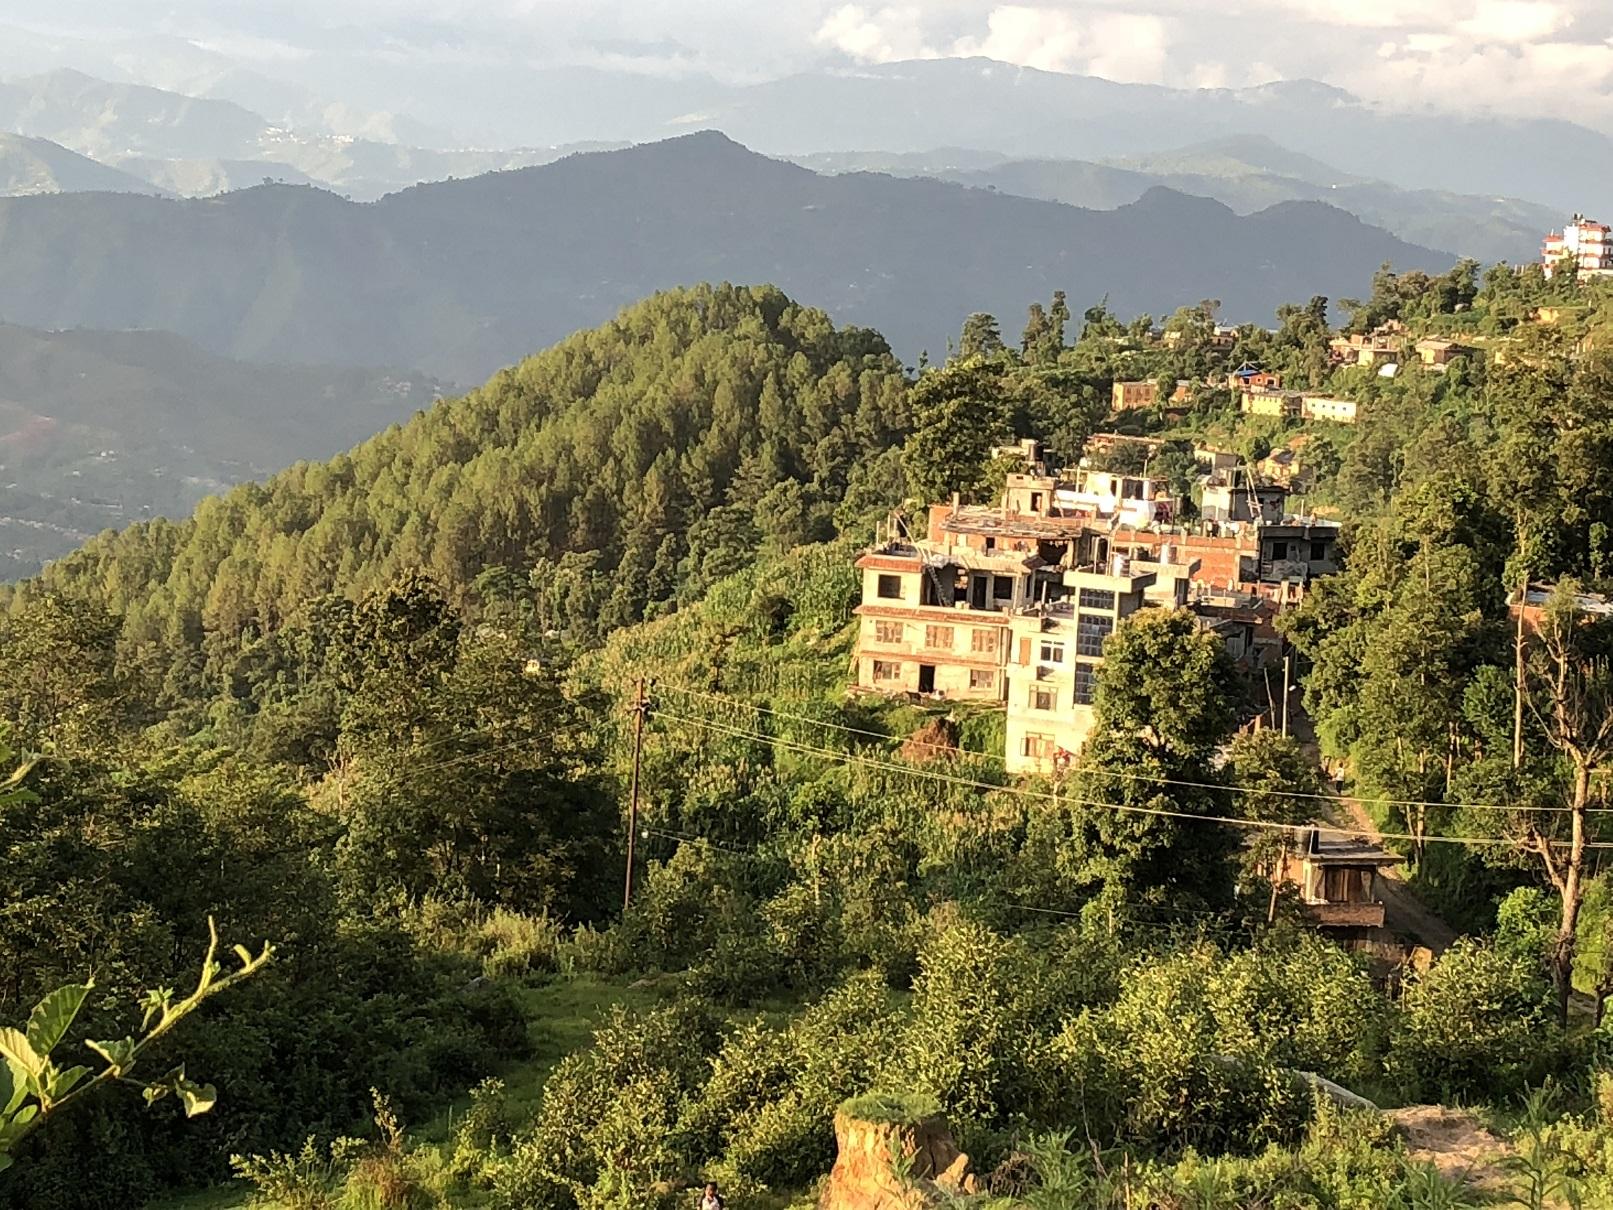 Michaela - Challenges Abroad Nepal Sustainability Challenge